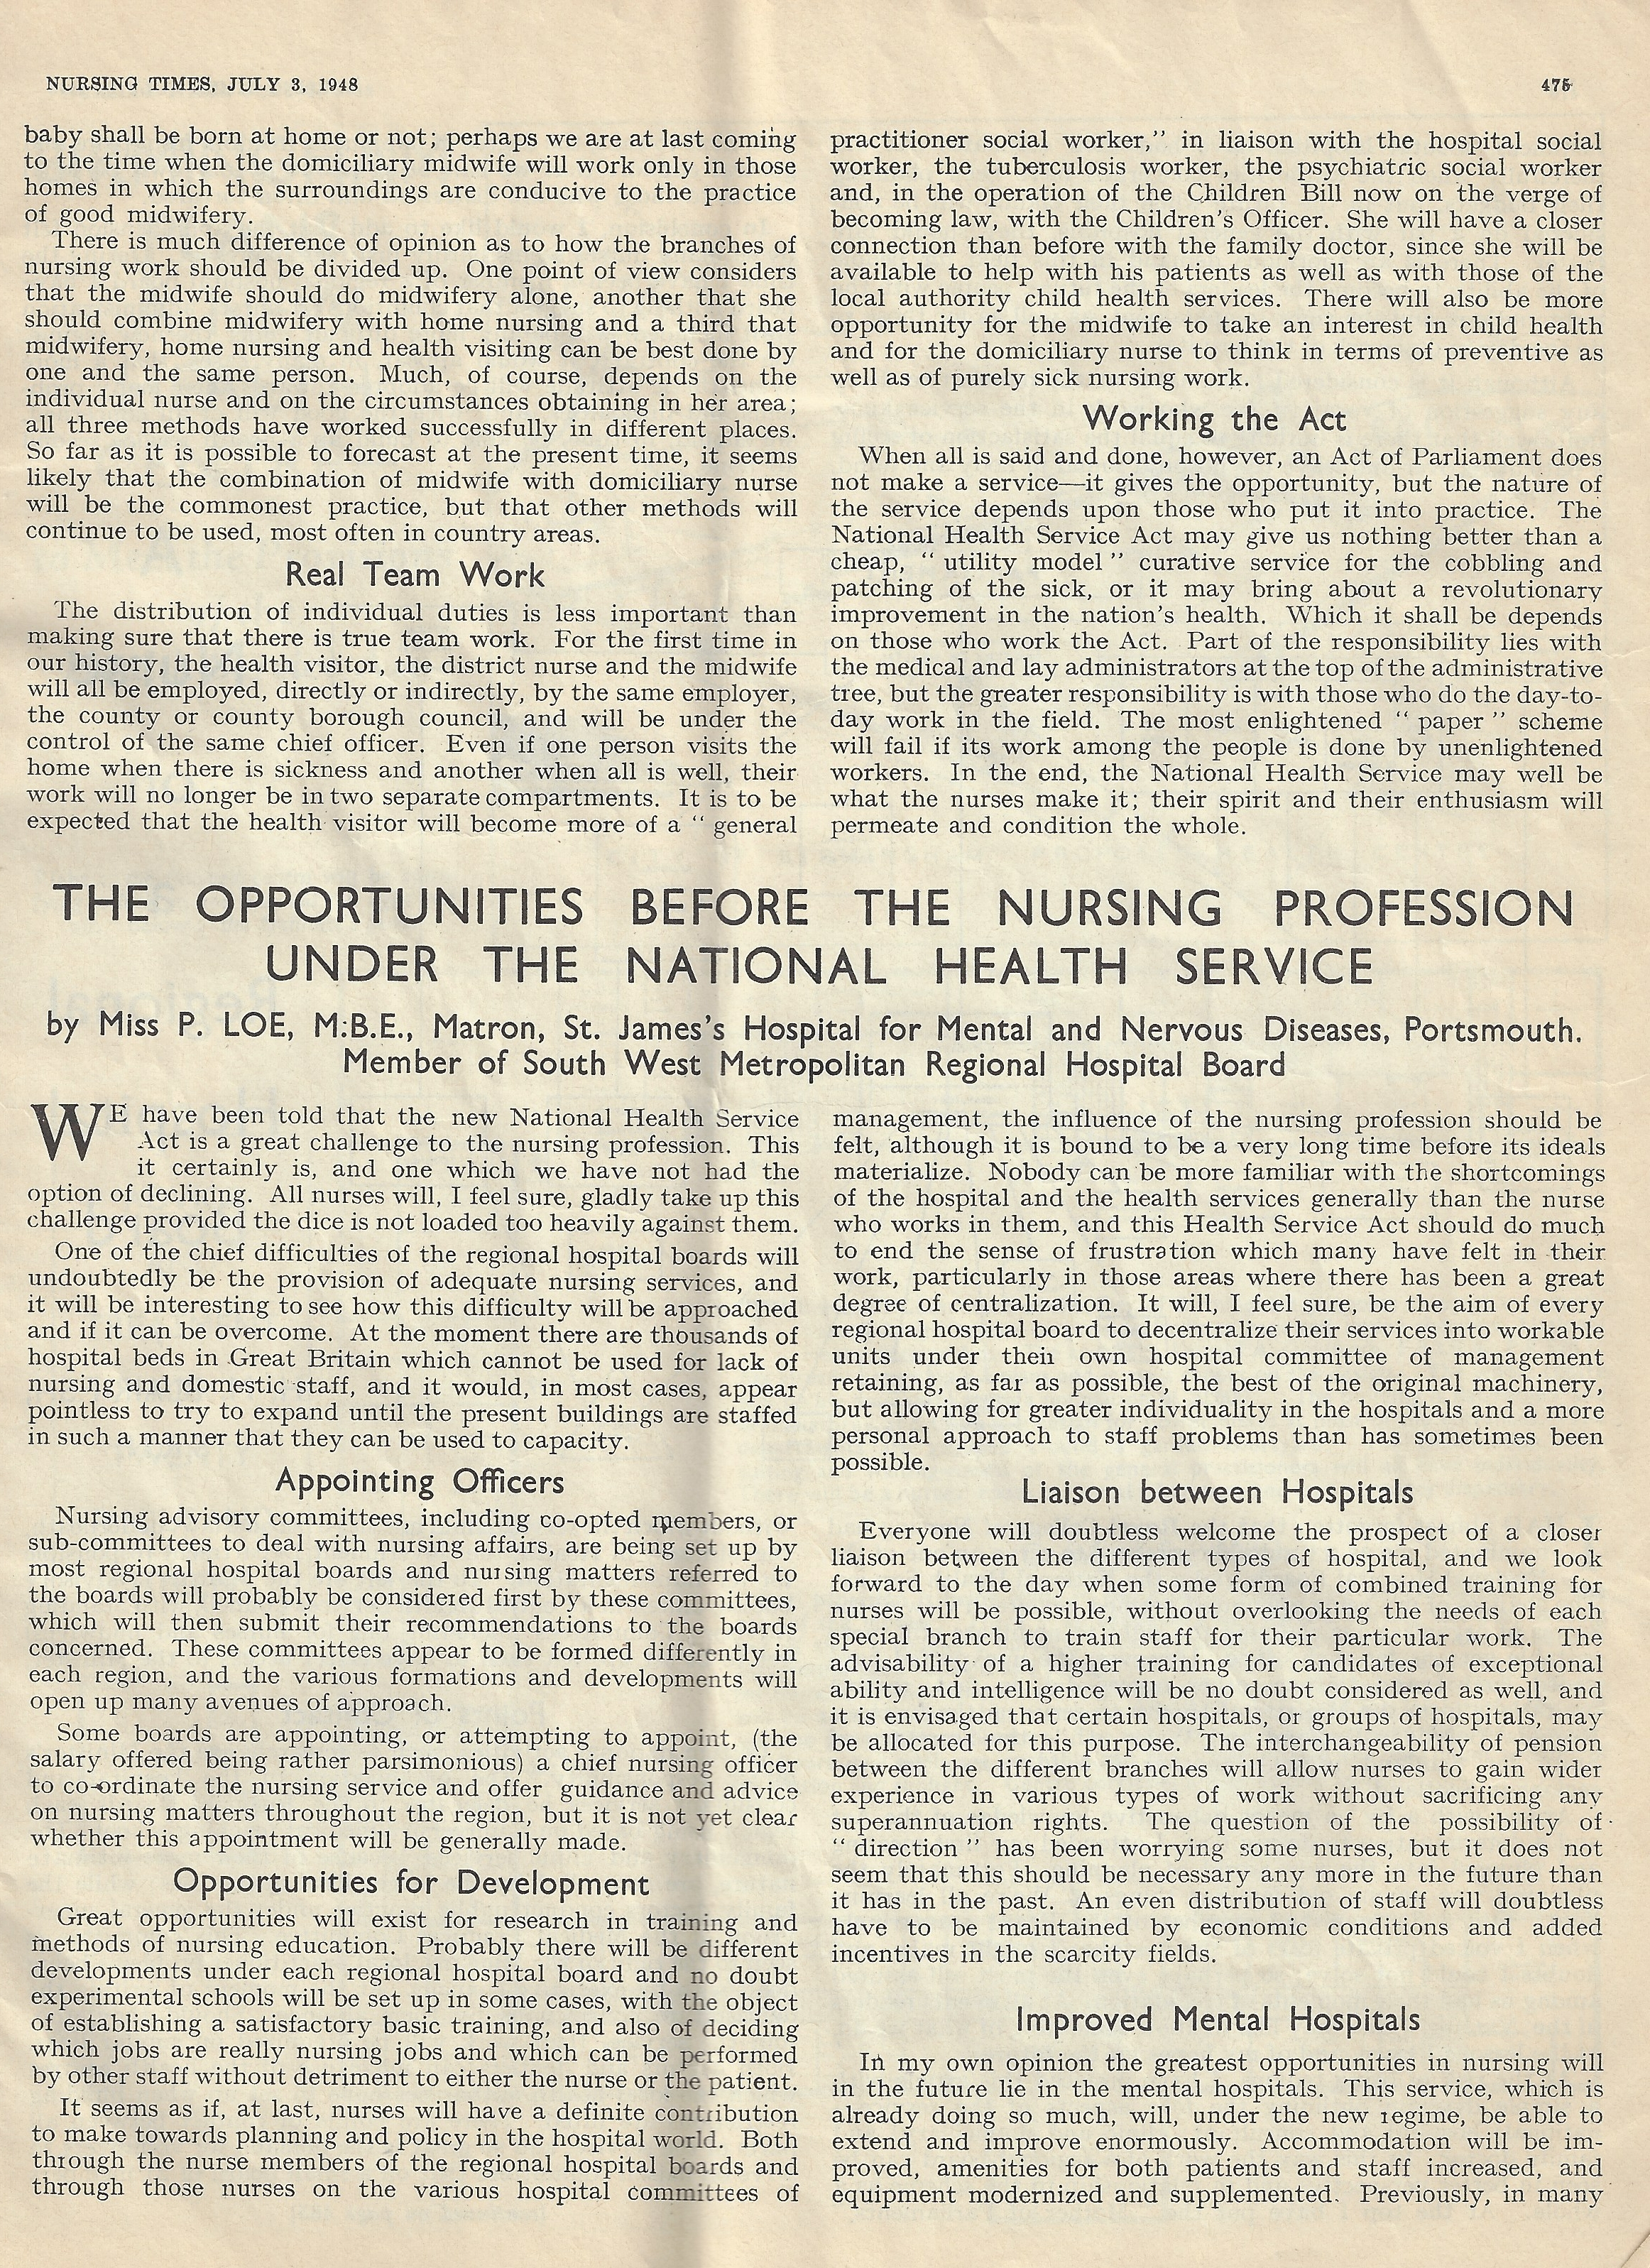 Nursing Times 1948 comments.jpg